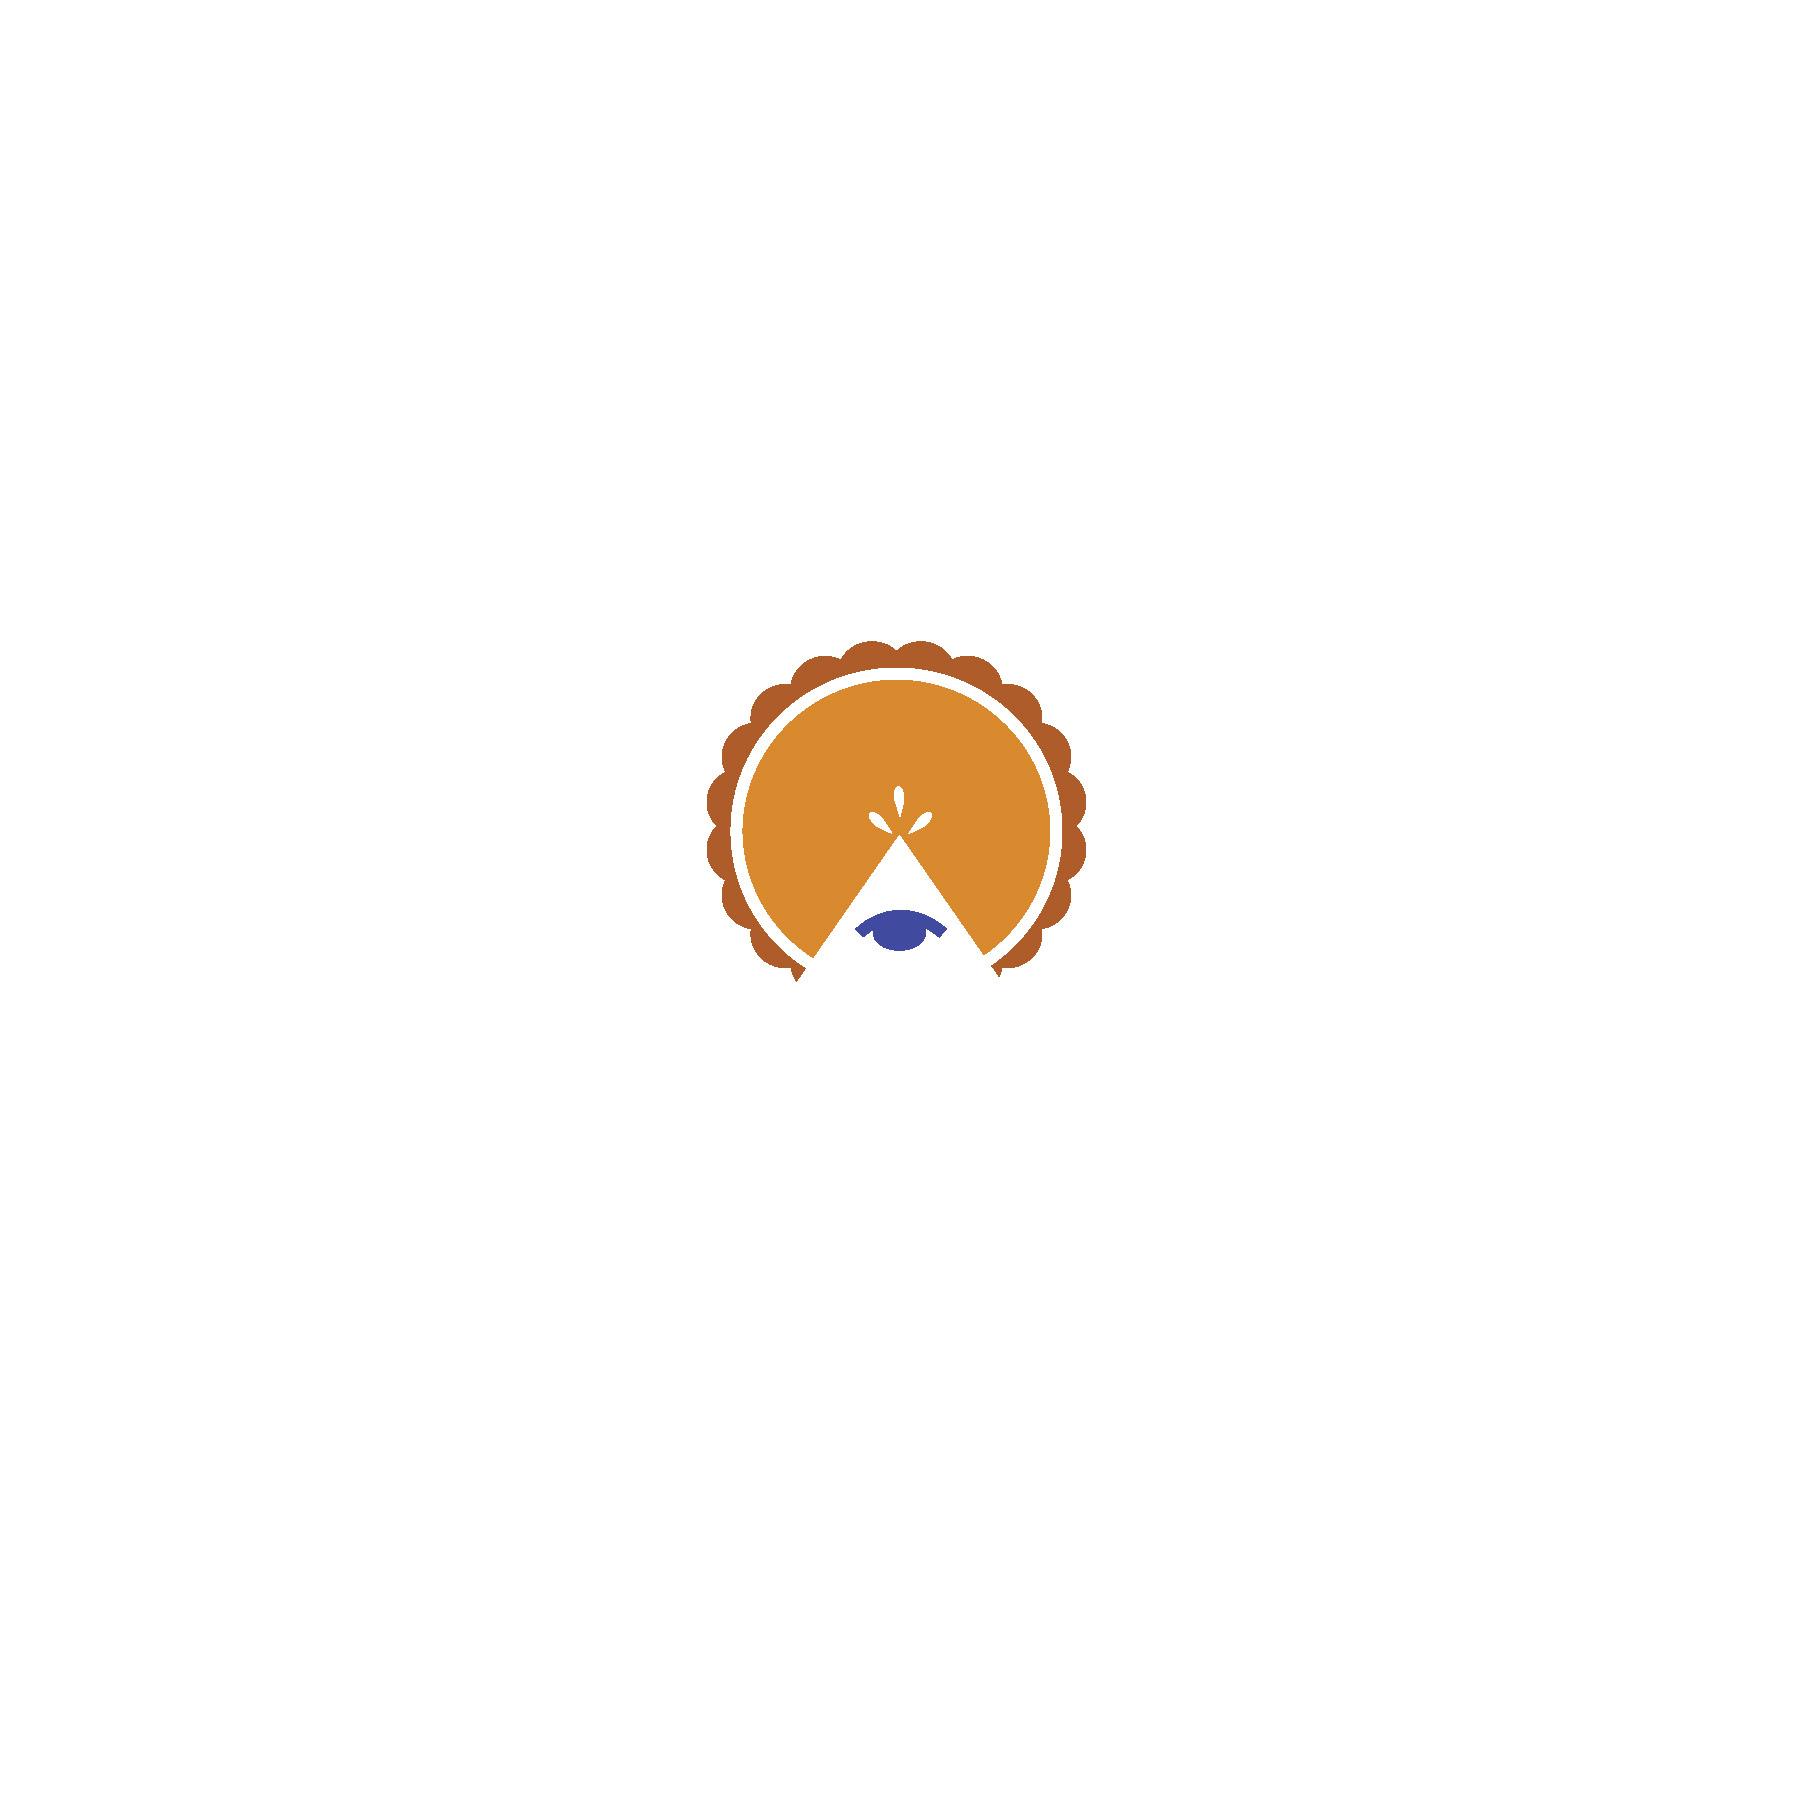 Savory Society Logos